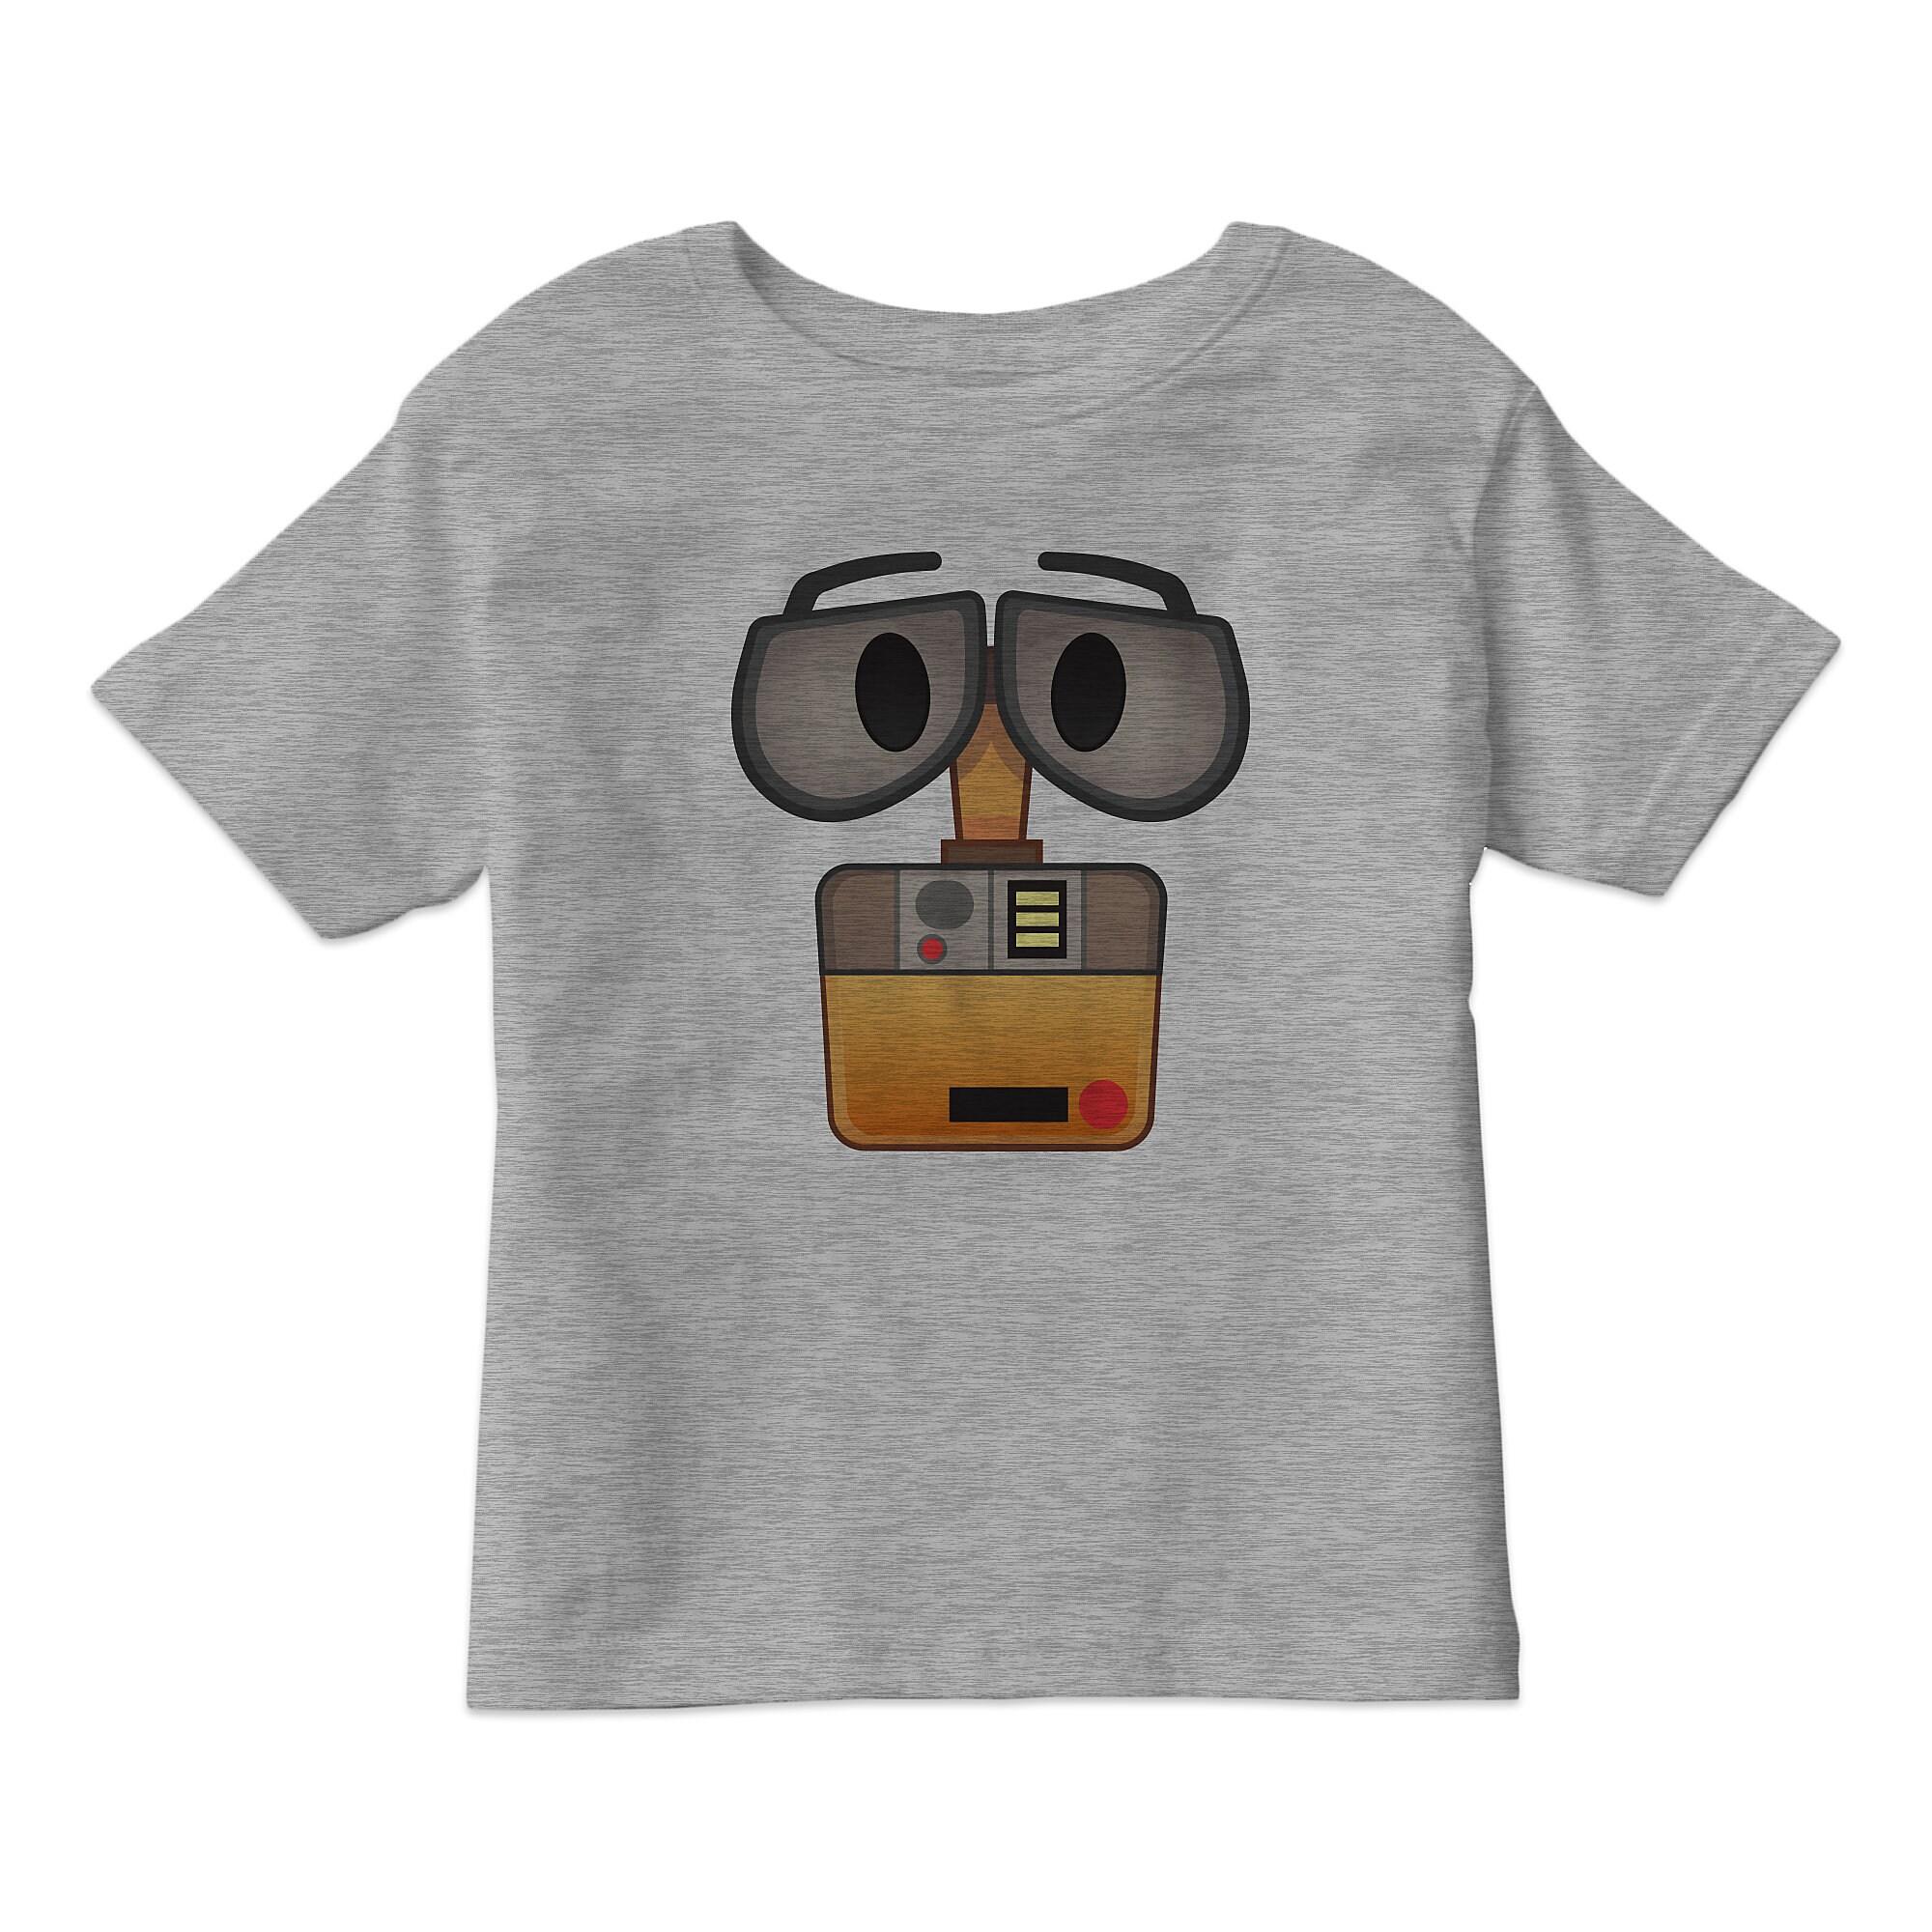 WALL•E Emoji Tee for Kids - Customizable